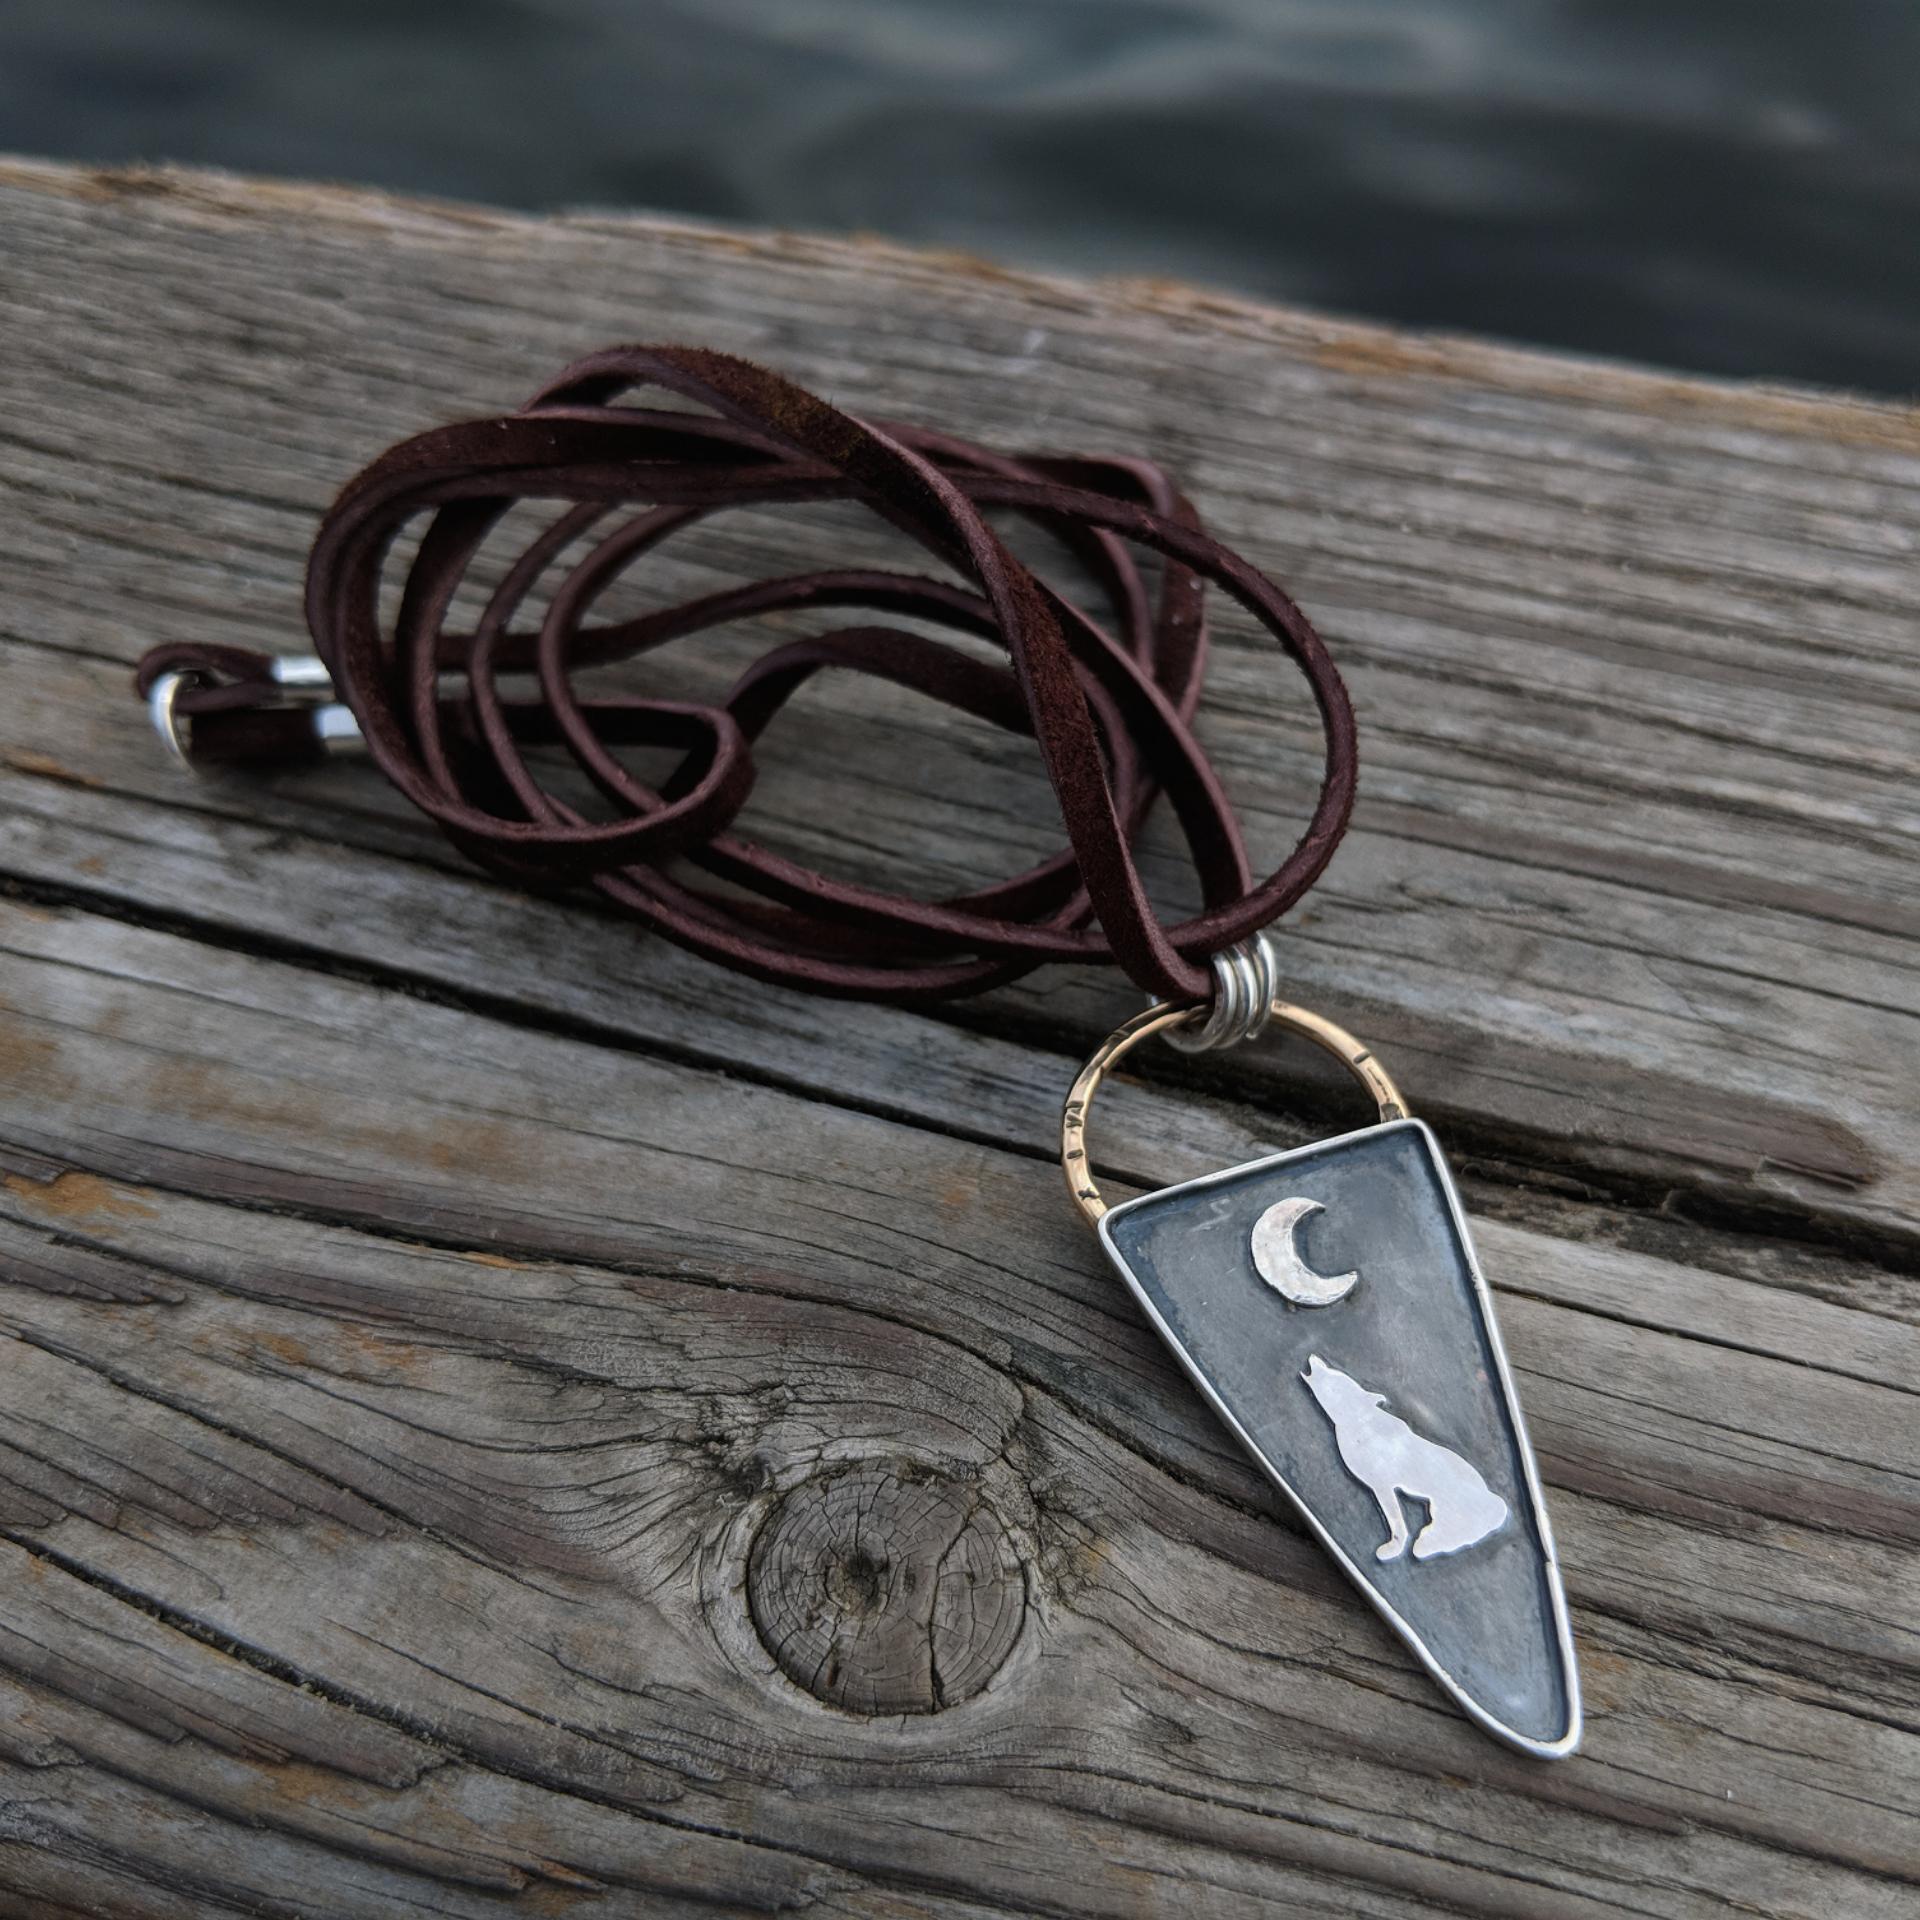 ckj-howling-wolf-pendant-silver-gold-jewelry-handmade-westcoast-vancouver-crescent-moon.jpg